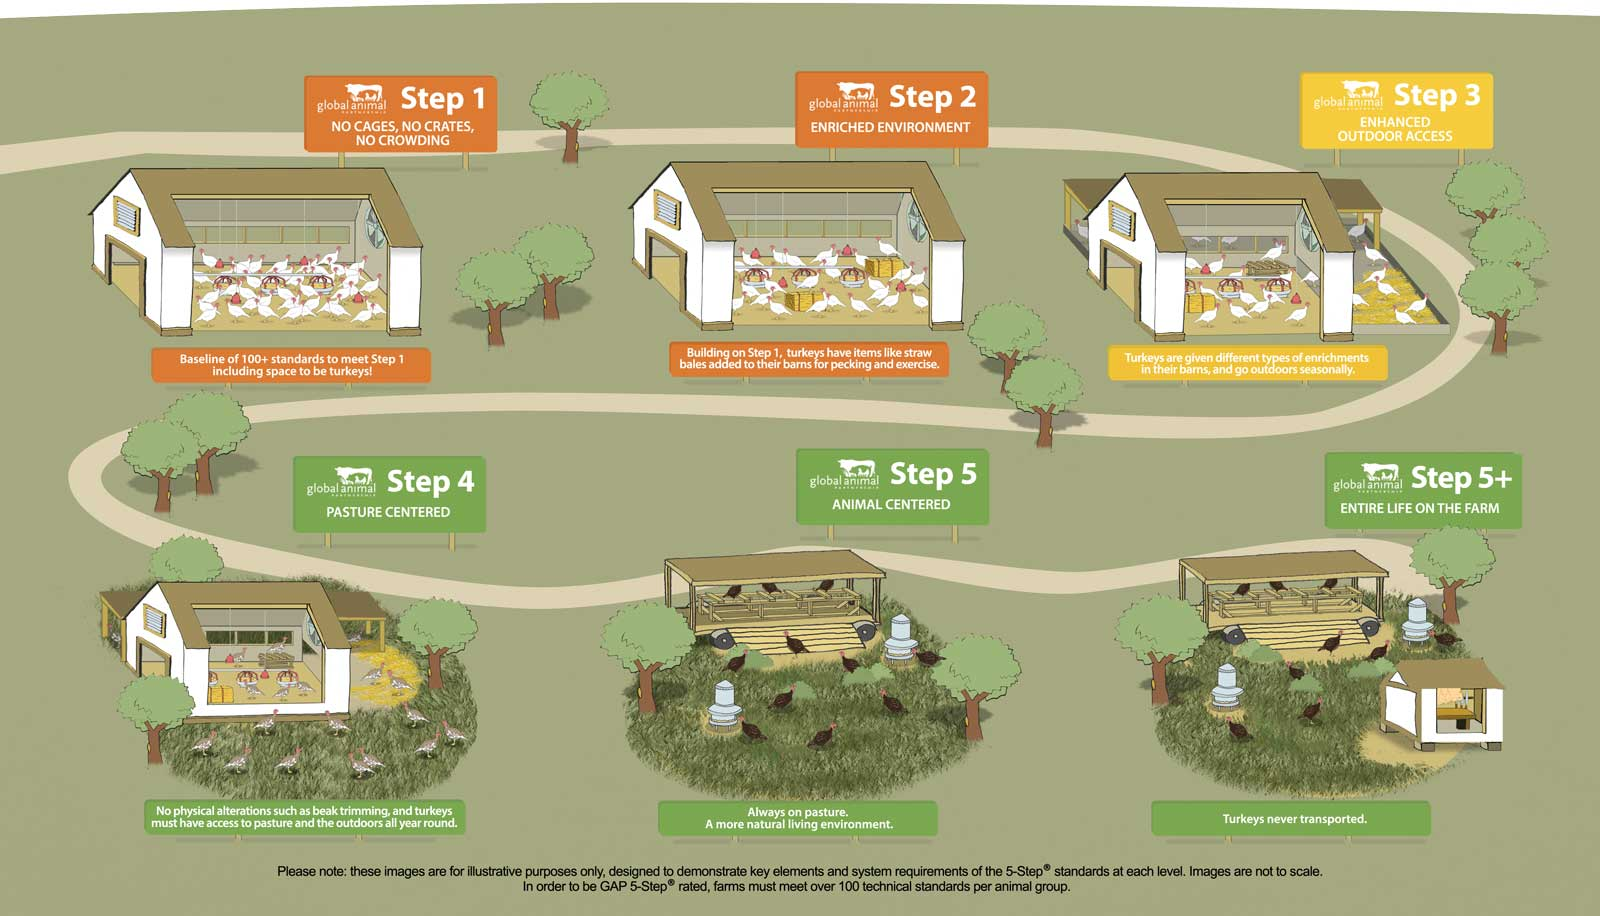 Turkey Farm Animal Welfare Steps